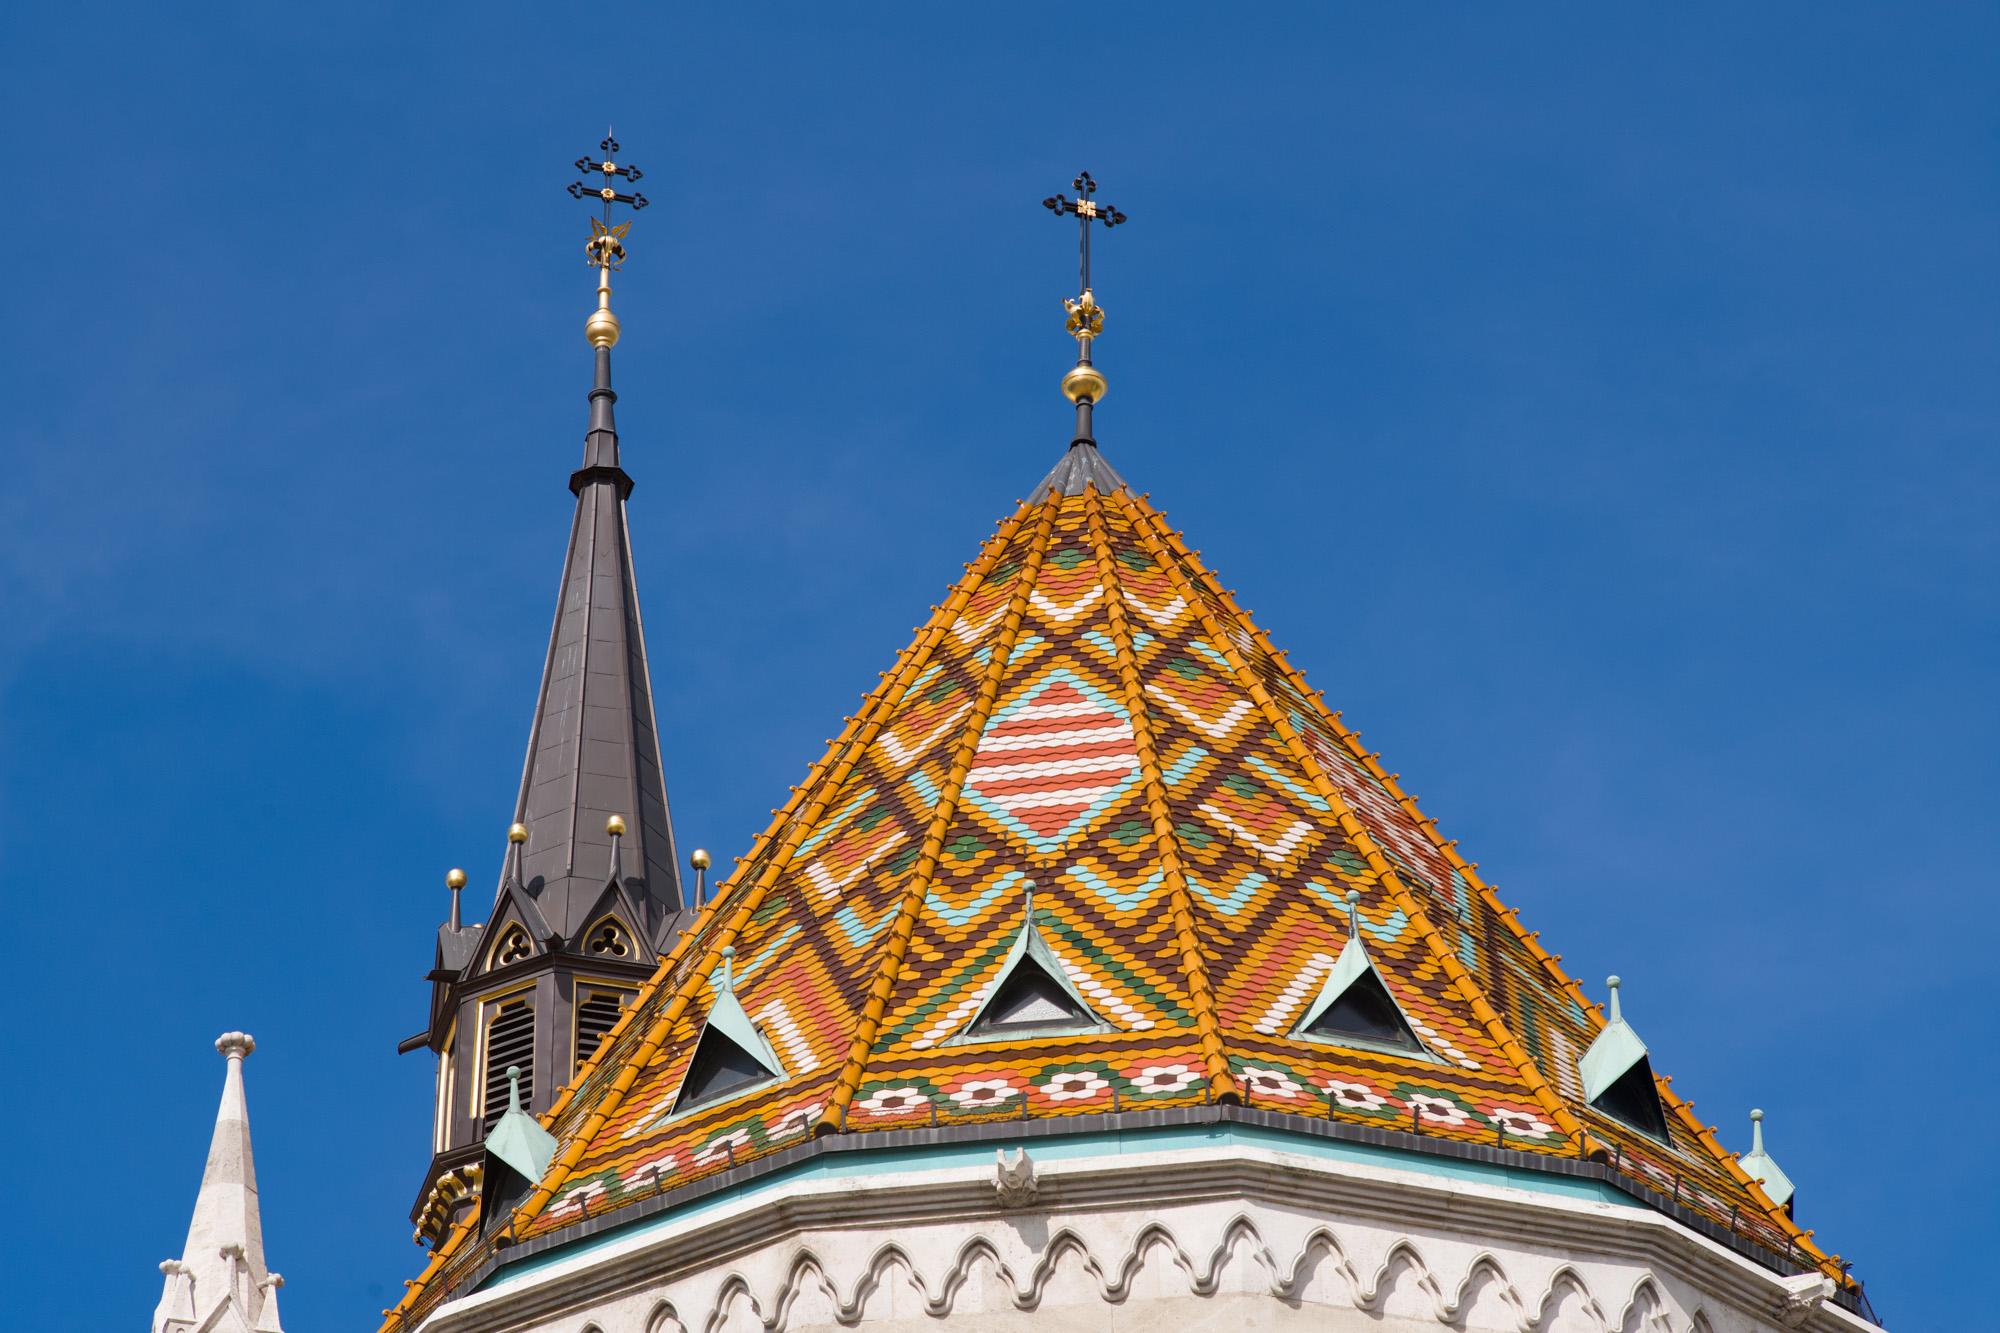 Roof tiles on Matthias Church